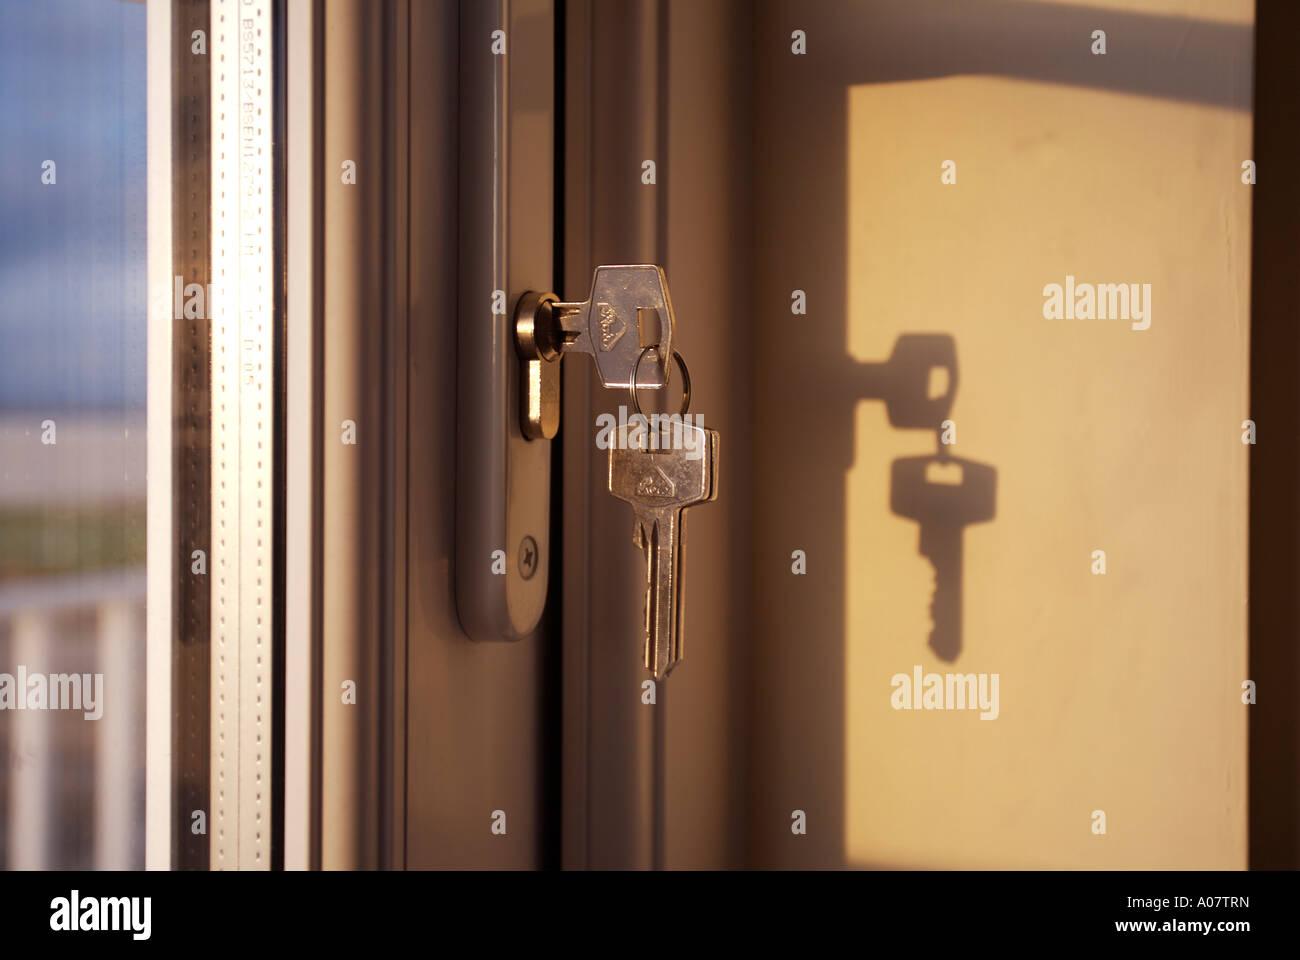 Keyes In Door Lock - Stock Image